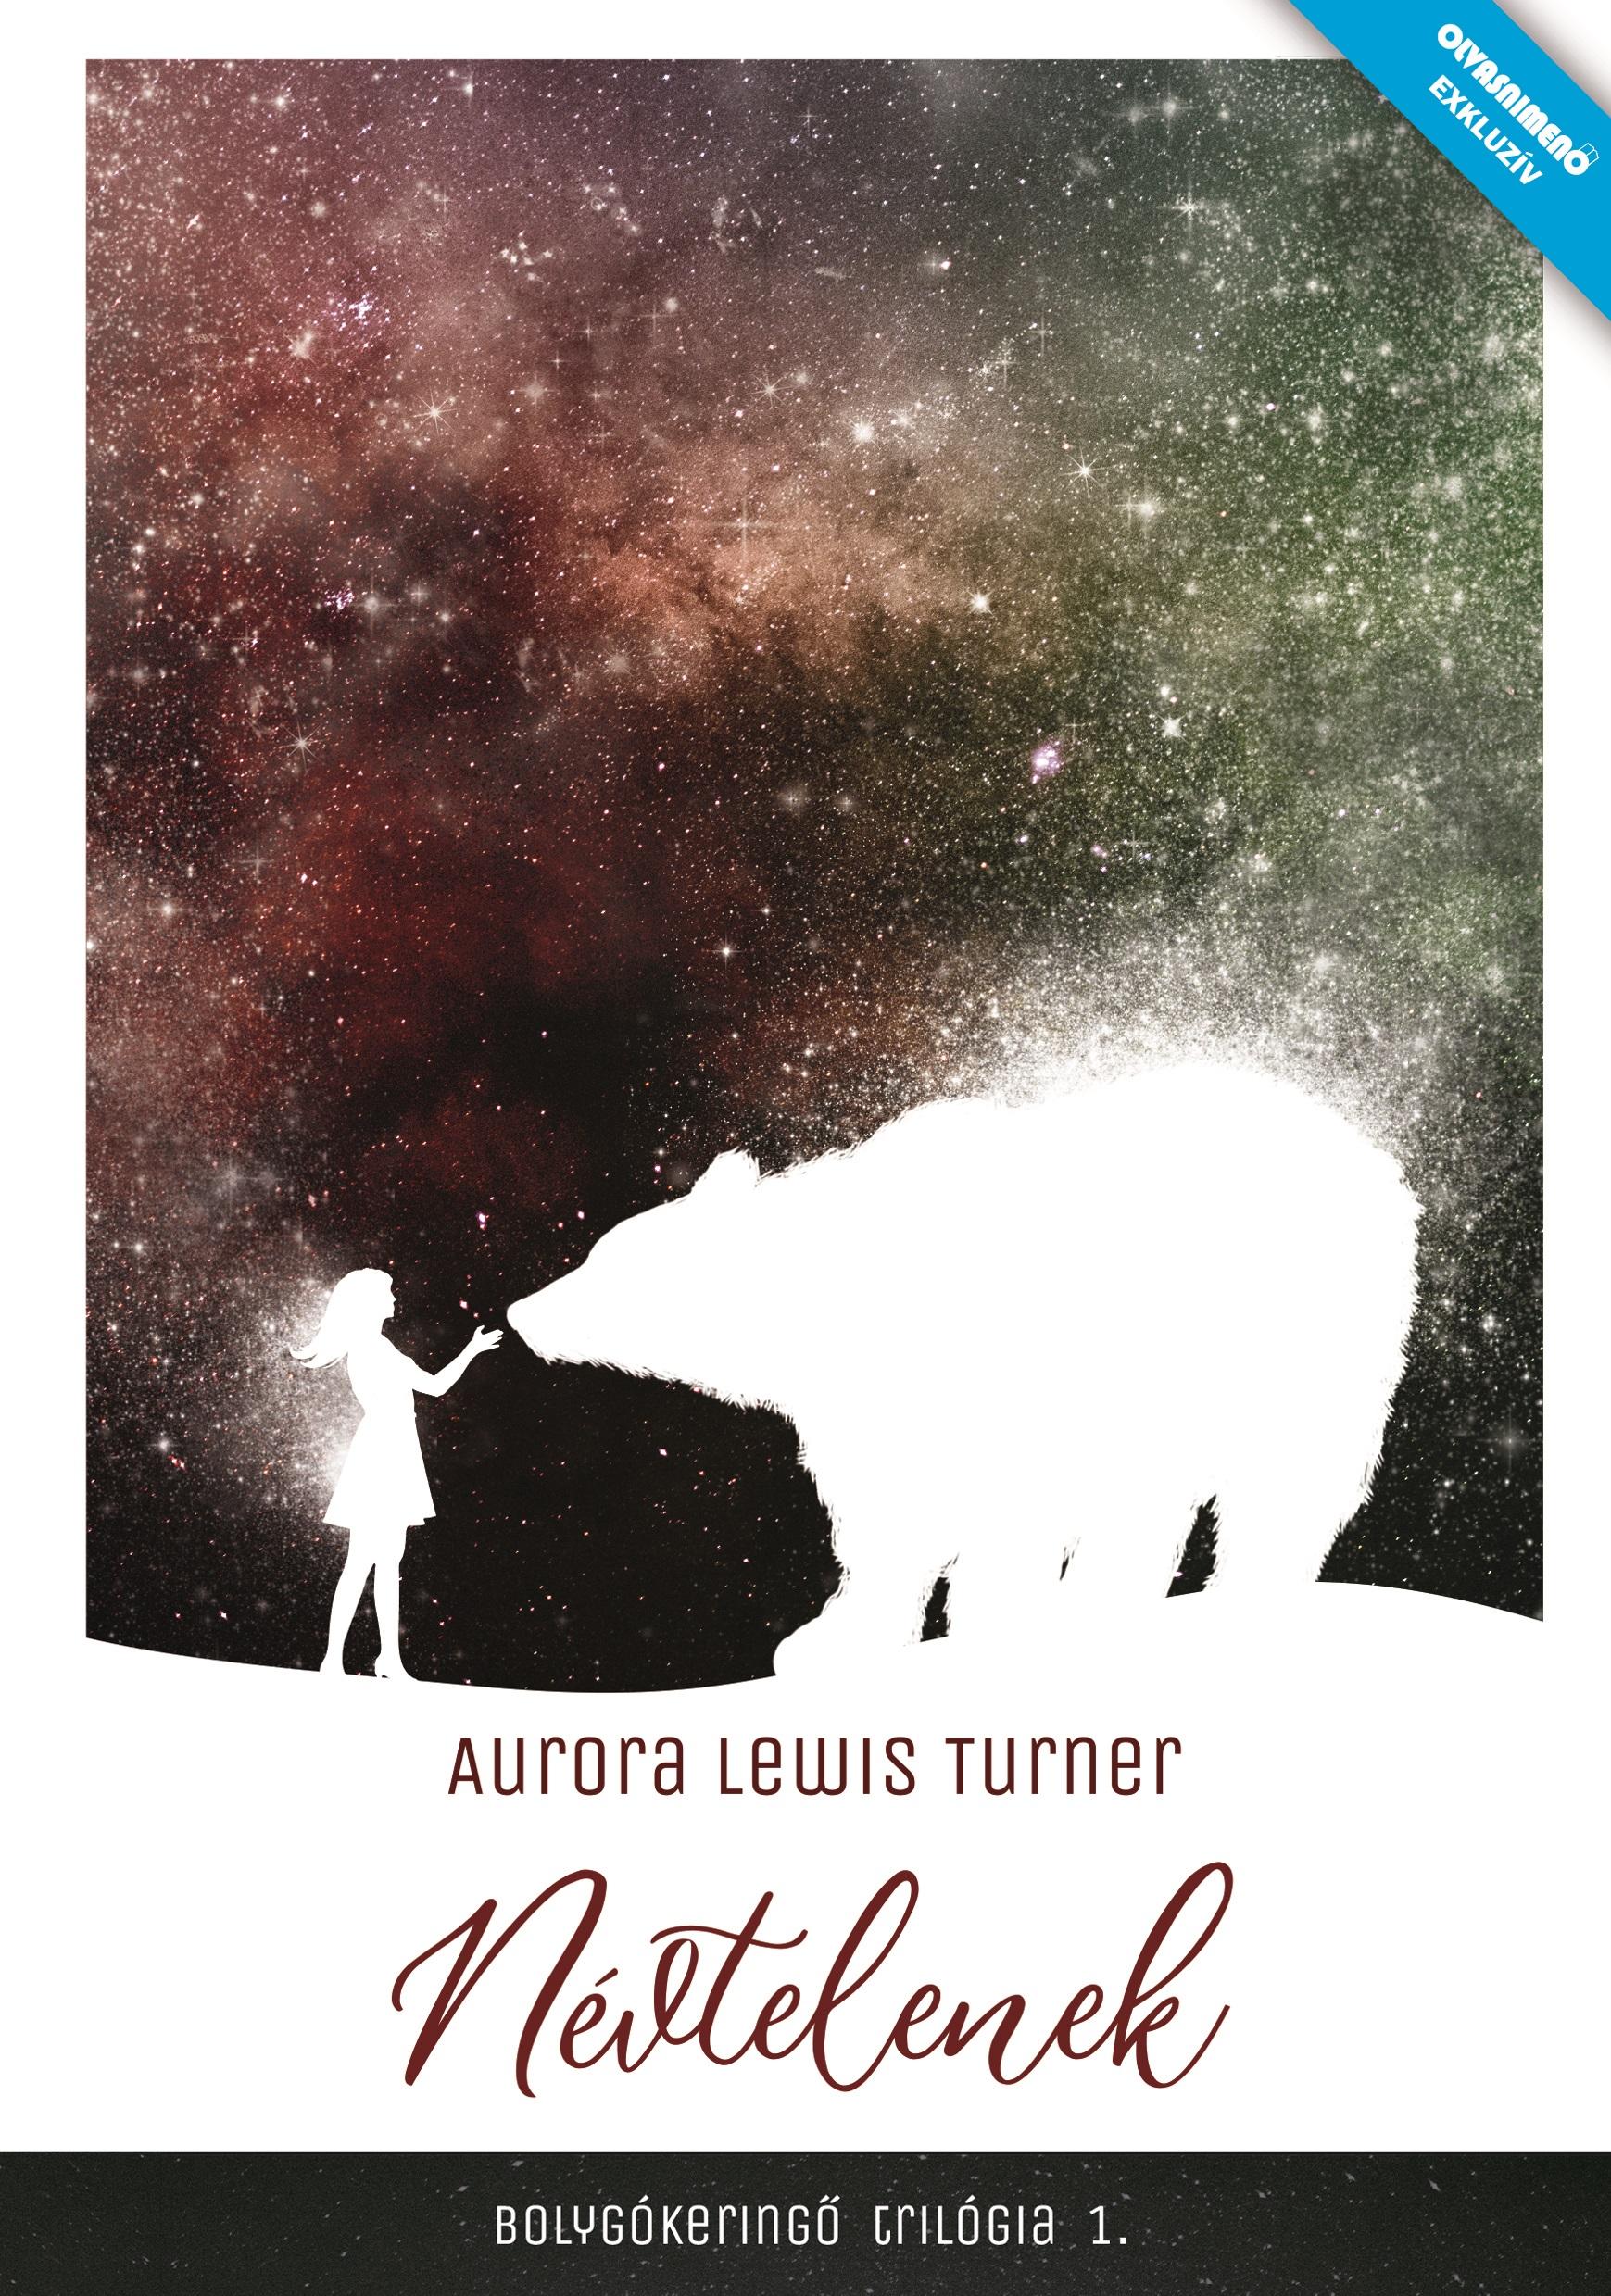 Aurora Lewis Turner - Névtelenek